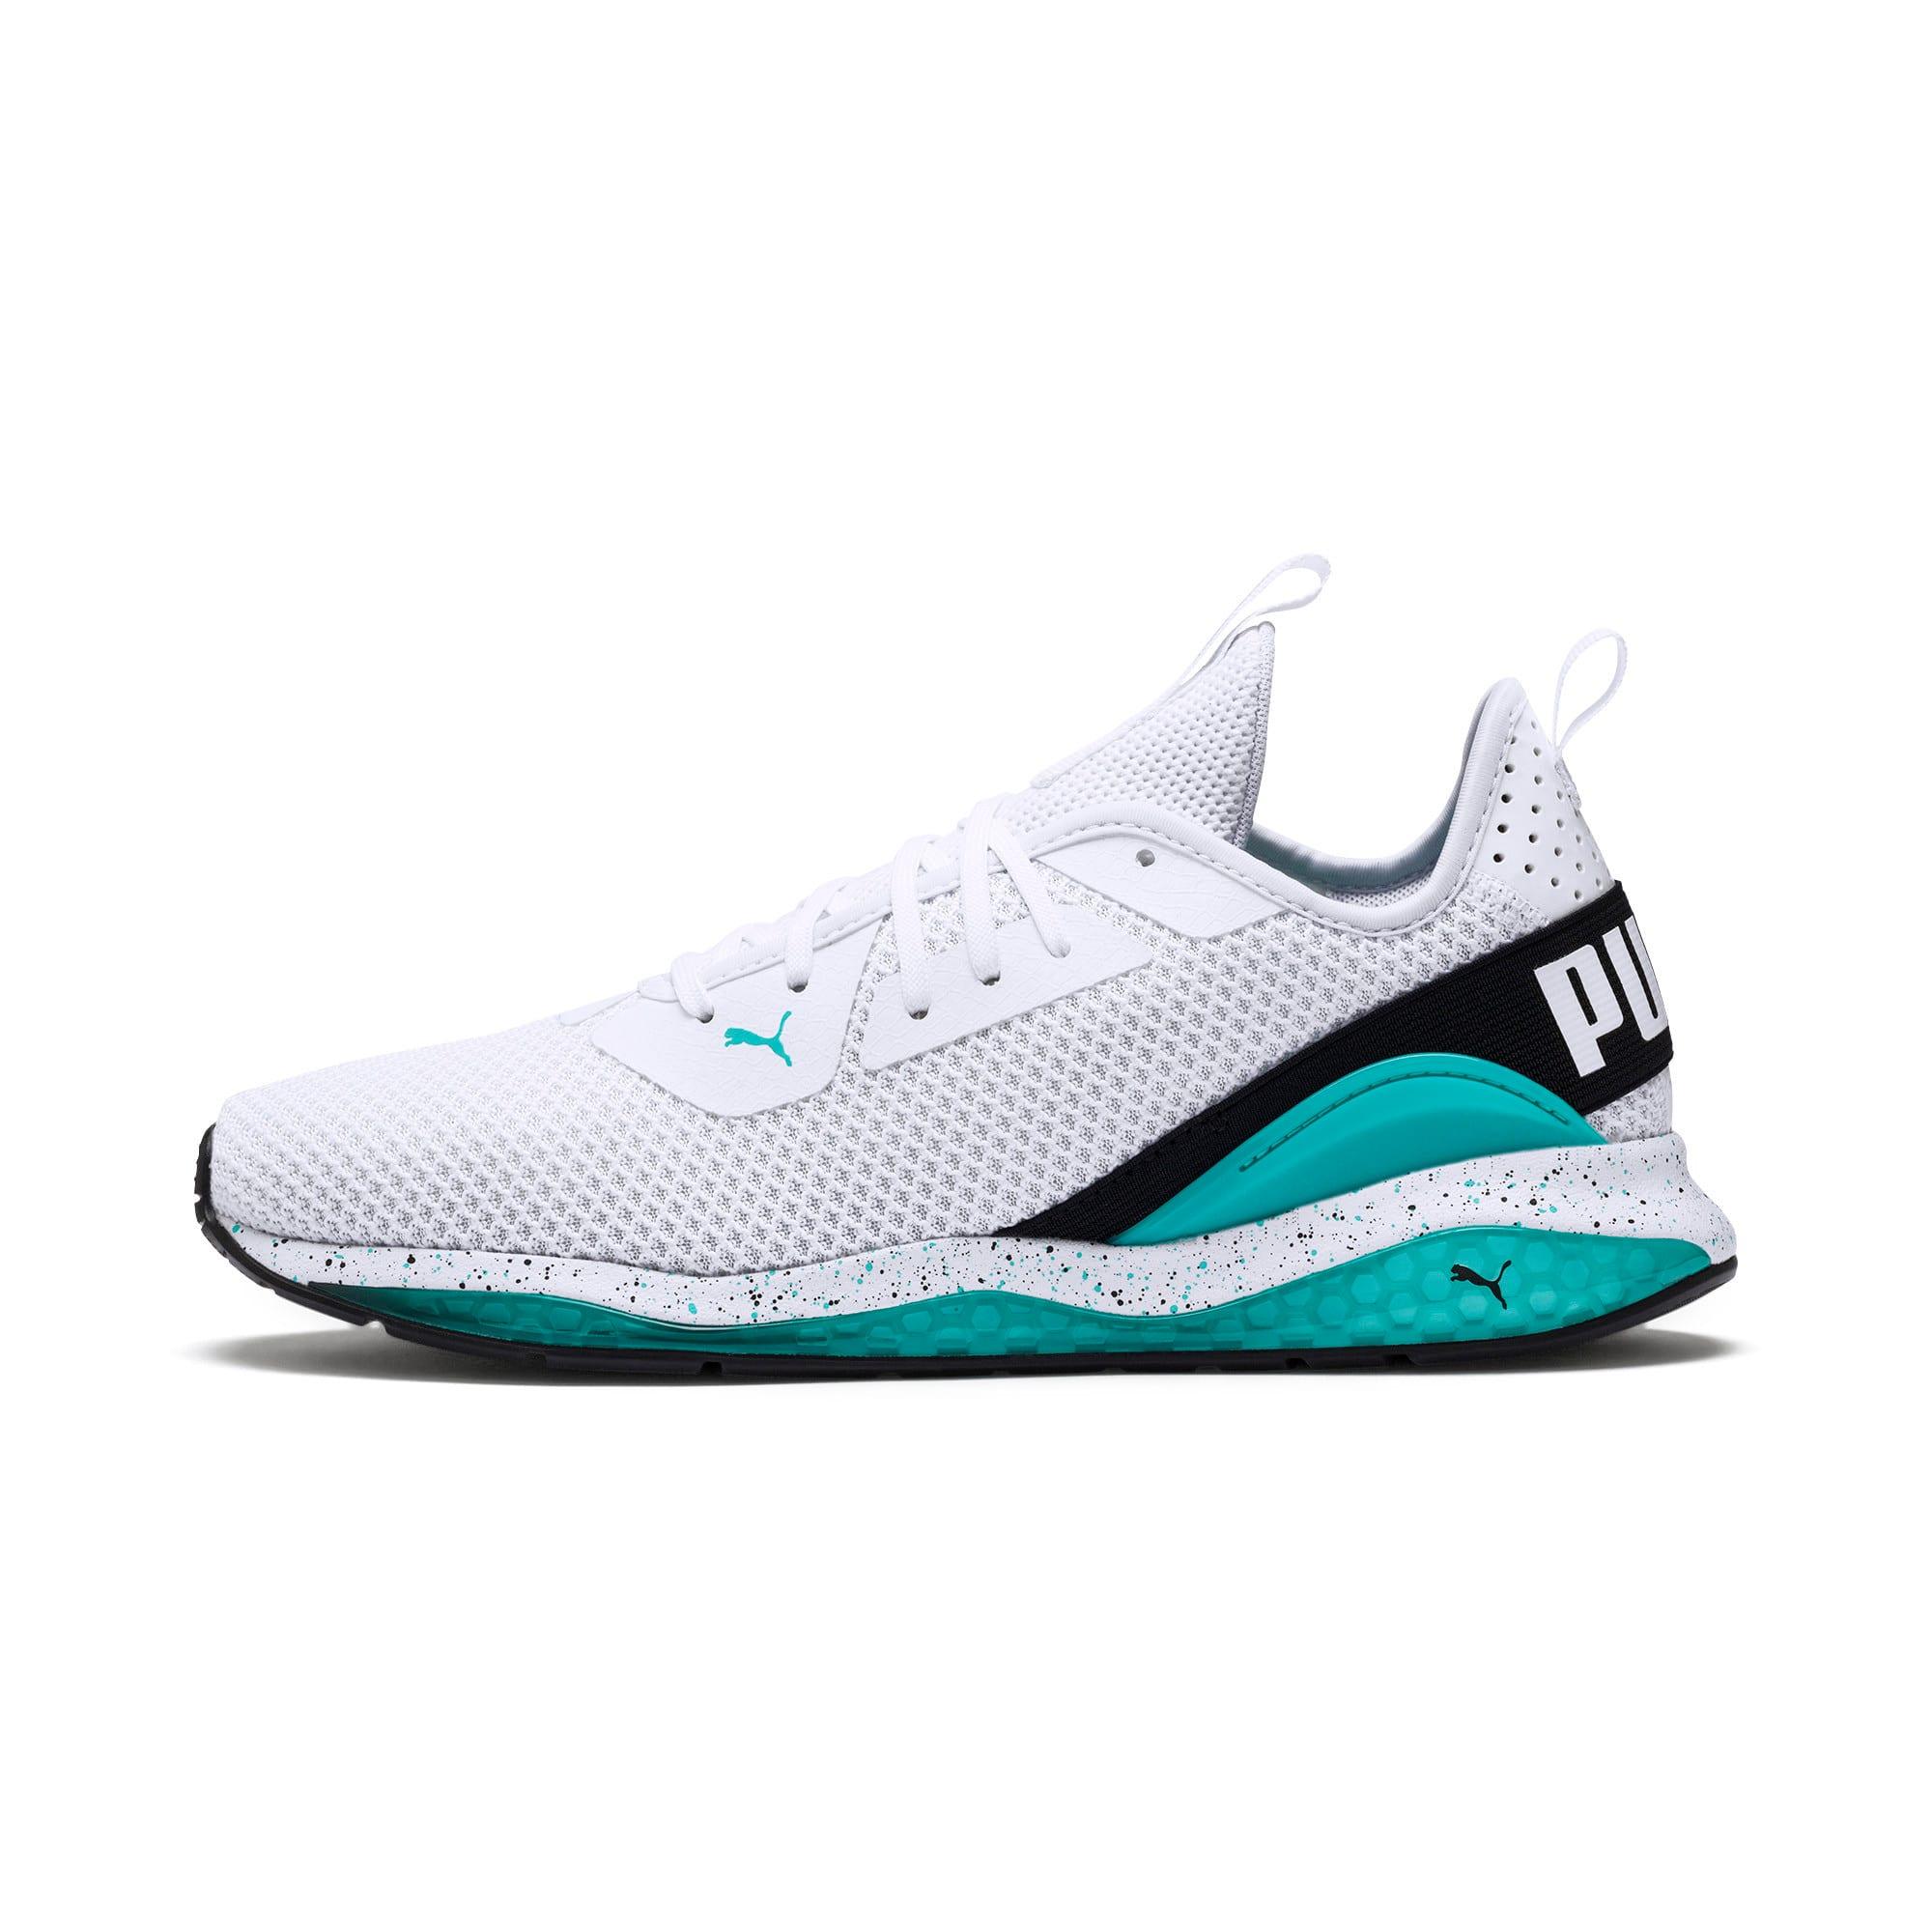 Miniatura 1 de Zapatos de entrenamiento CELL Descend Weave para hombre, White-Black-Blue Turquoise, mediano